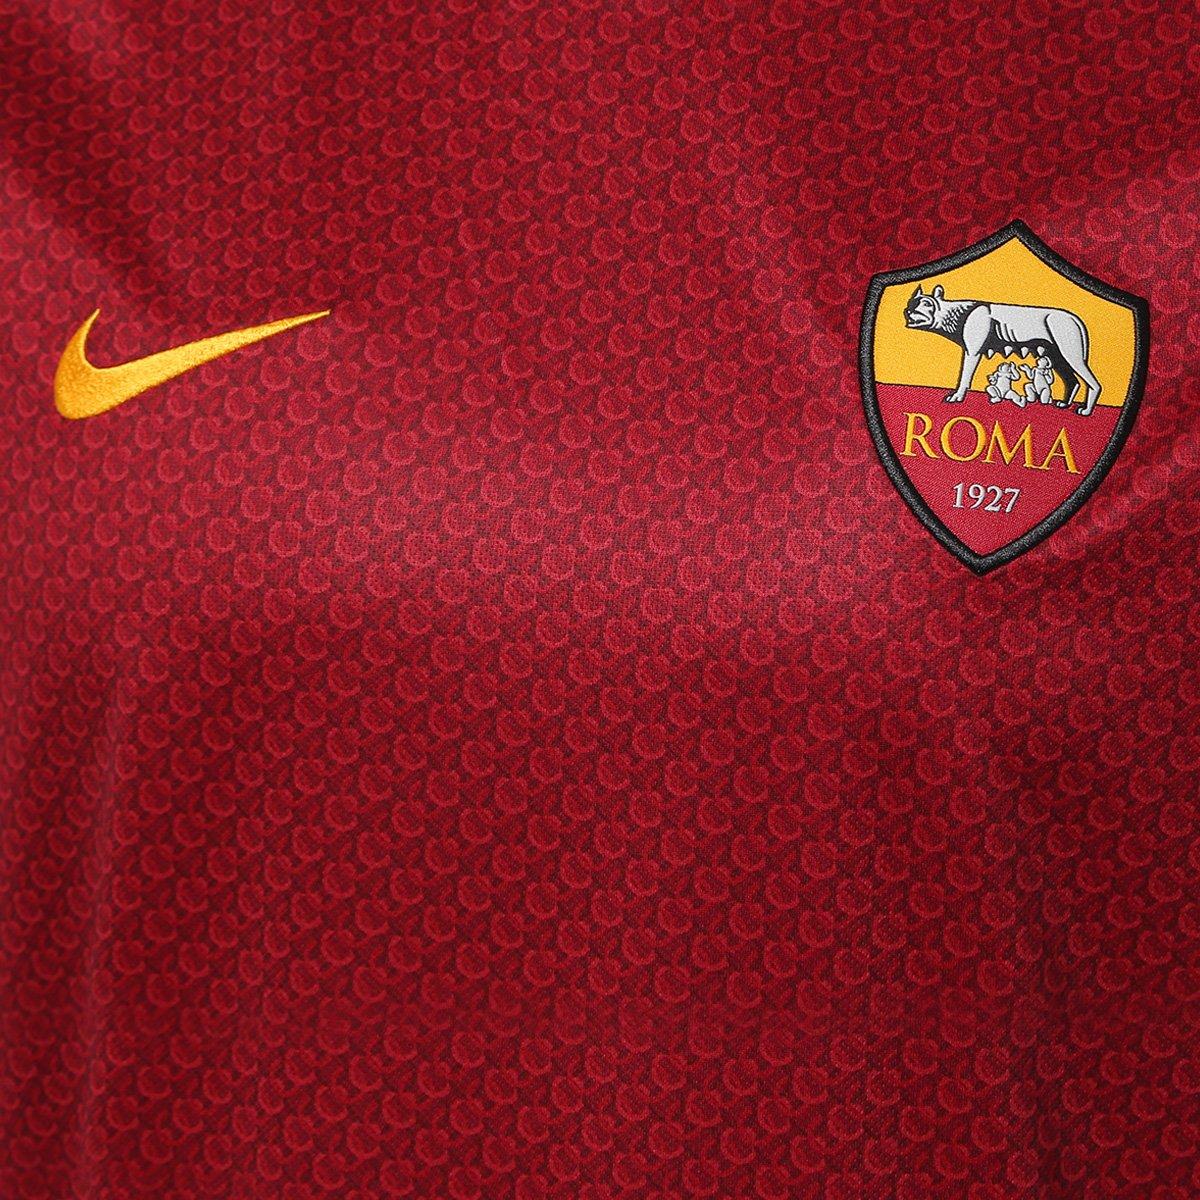 51f38e5d3f Camisa Roma Home 2018 s n° - Torcedor Nike Masculina - Vermelho e ...